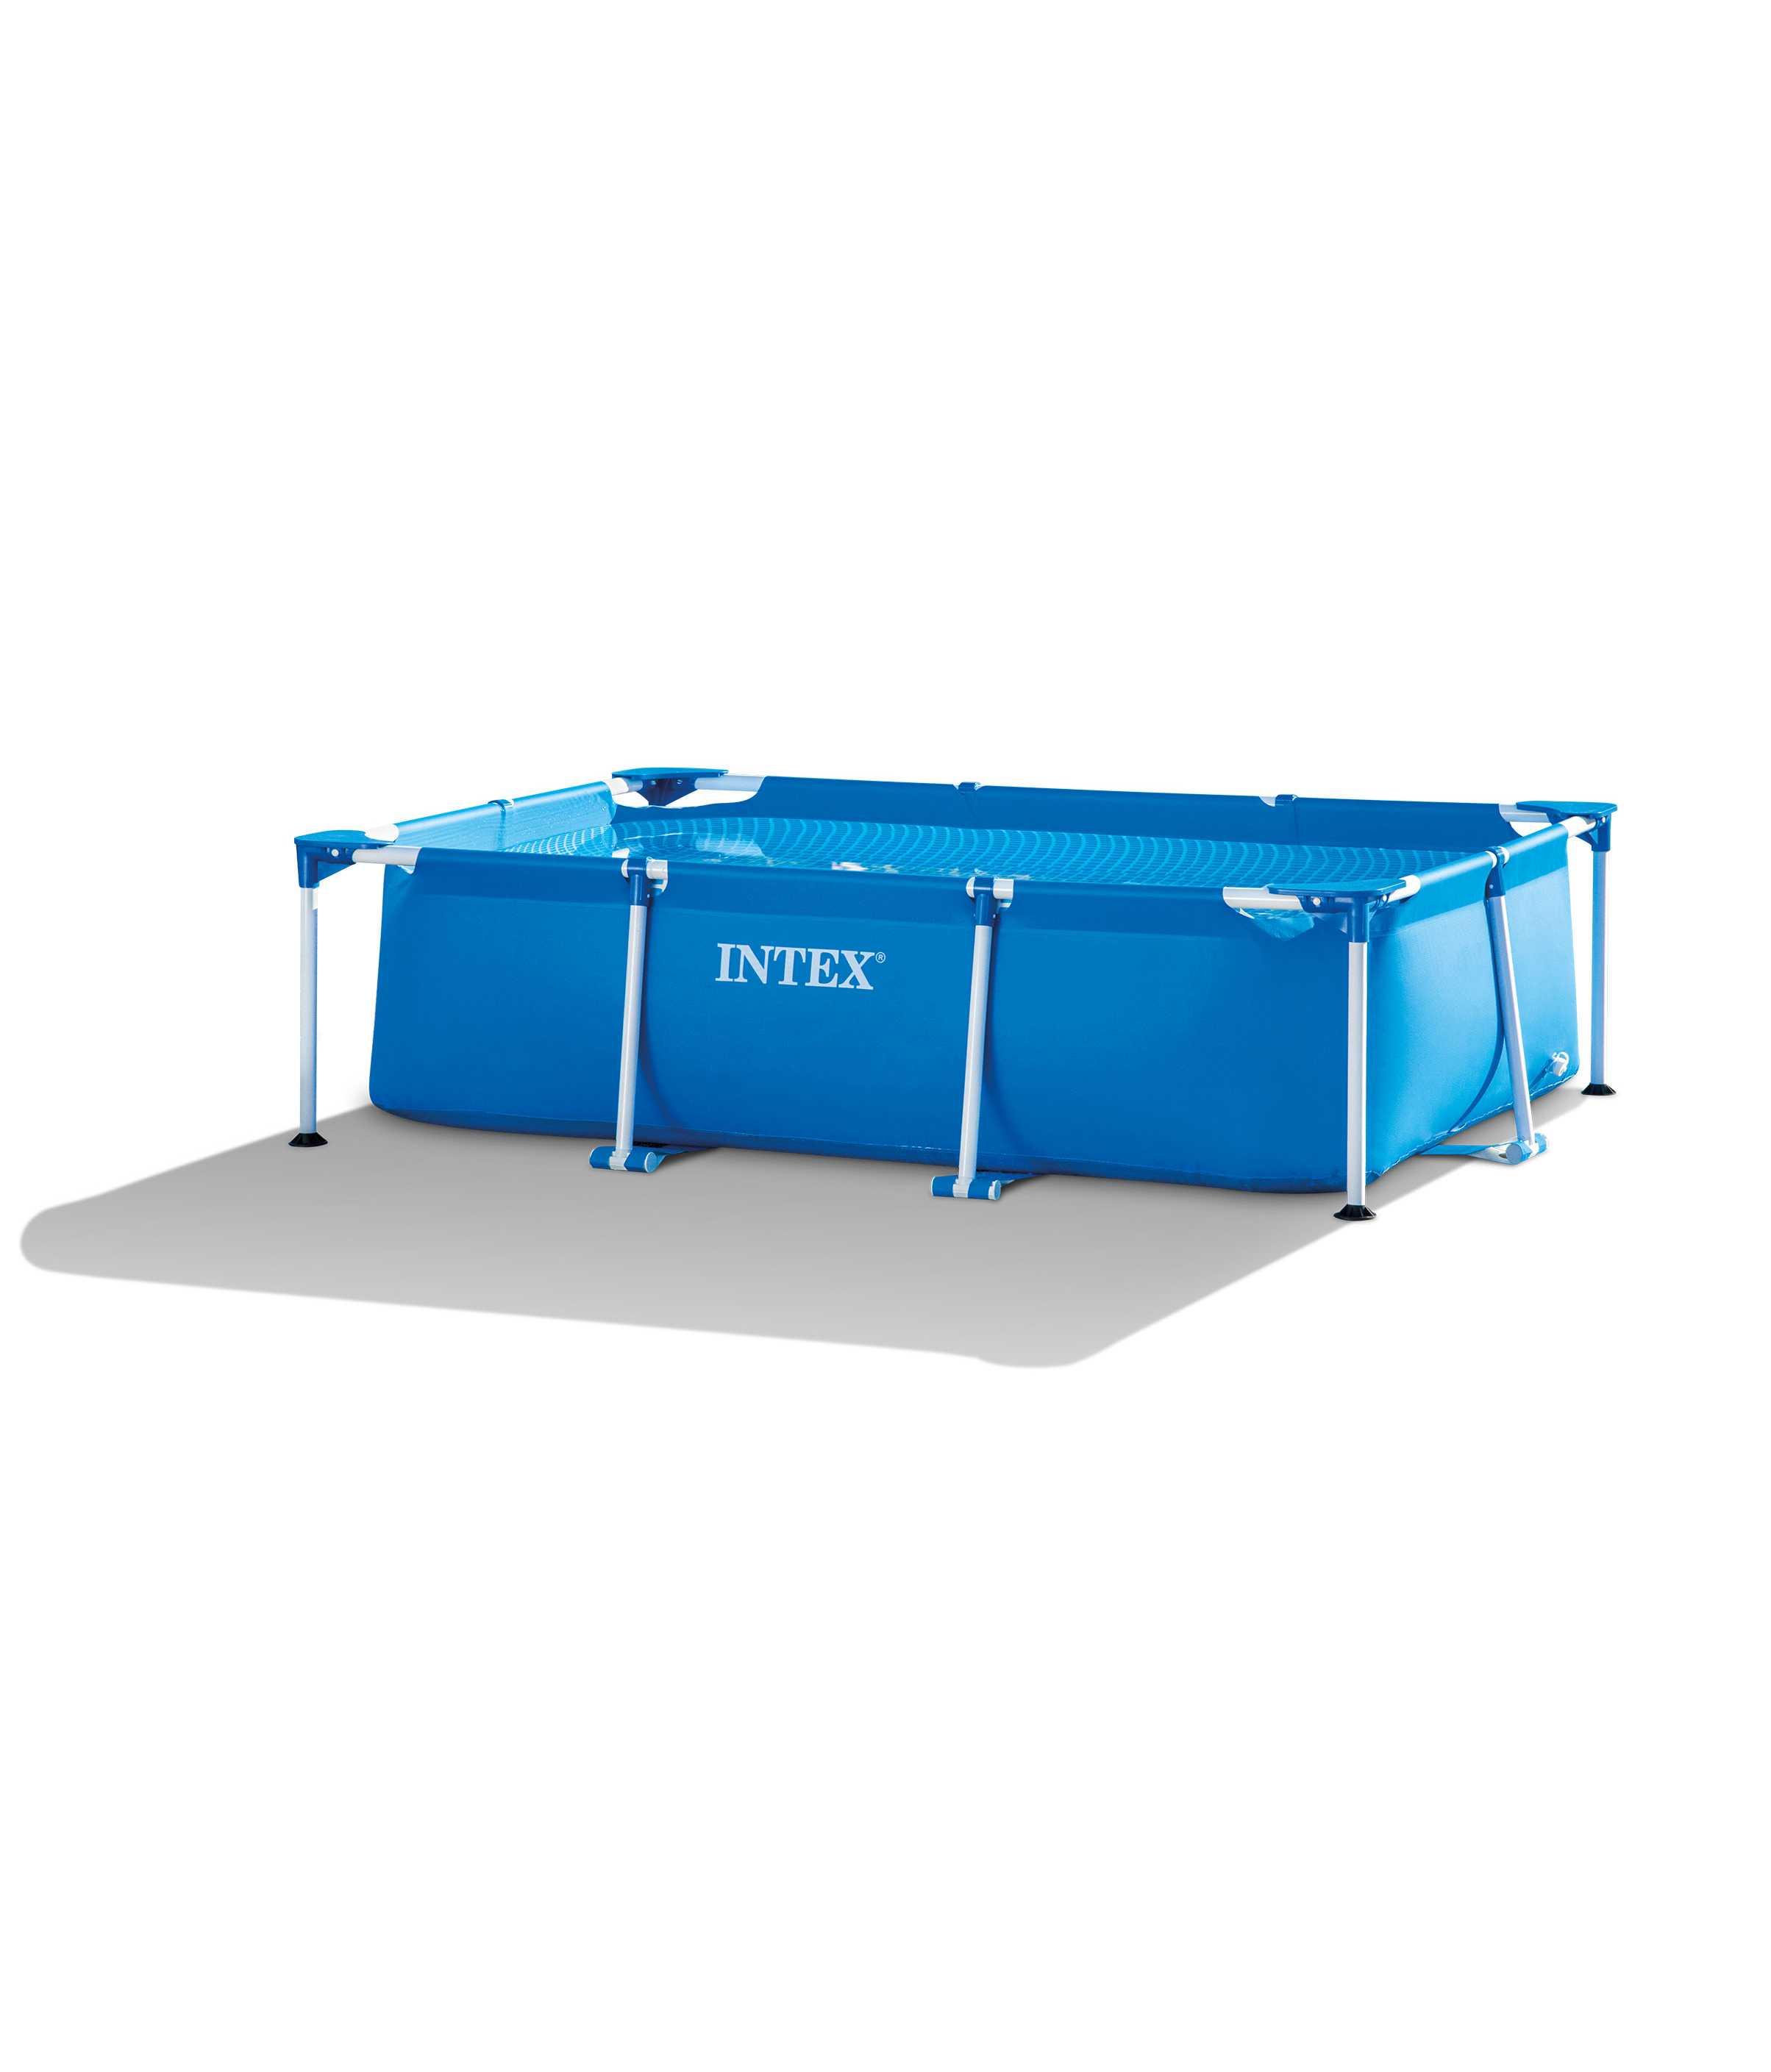 Scaffold Rectangular Pool For Garden Summer Leisure Summer Outdoor Size 220x150x60 Cm, 1662 L, Intex, Blue, Item No. 28270